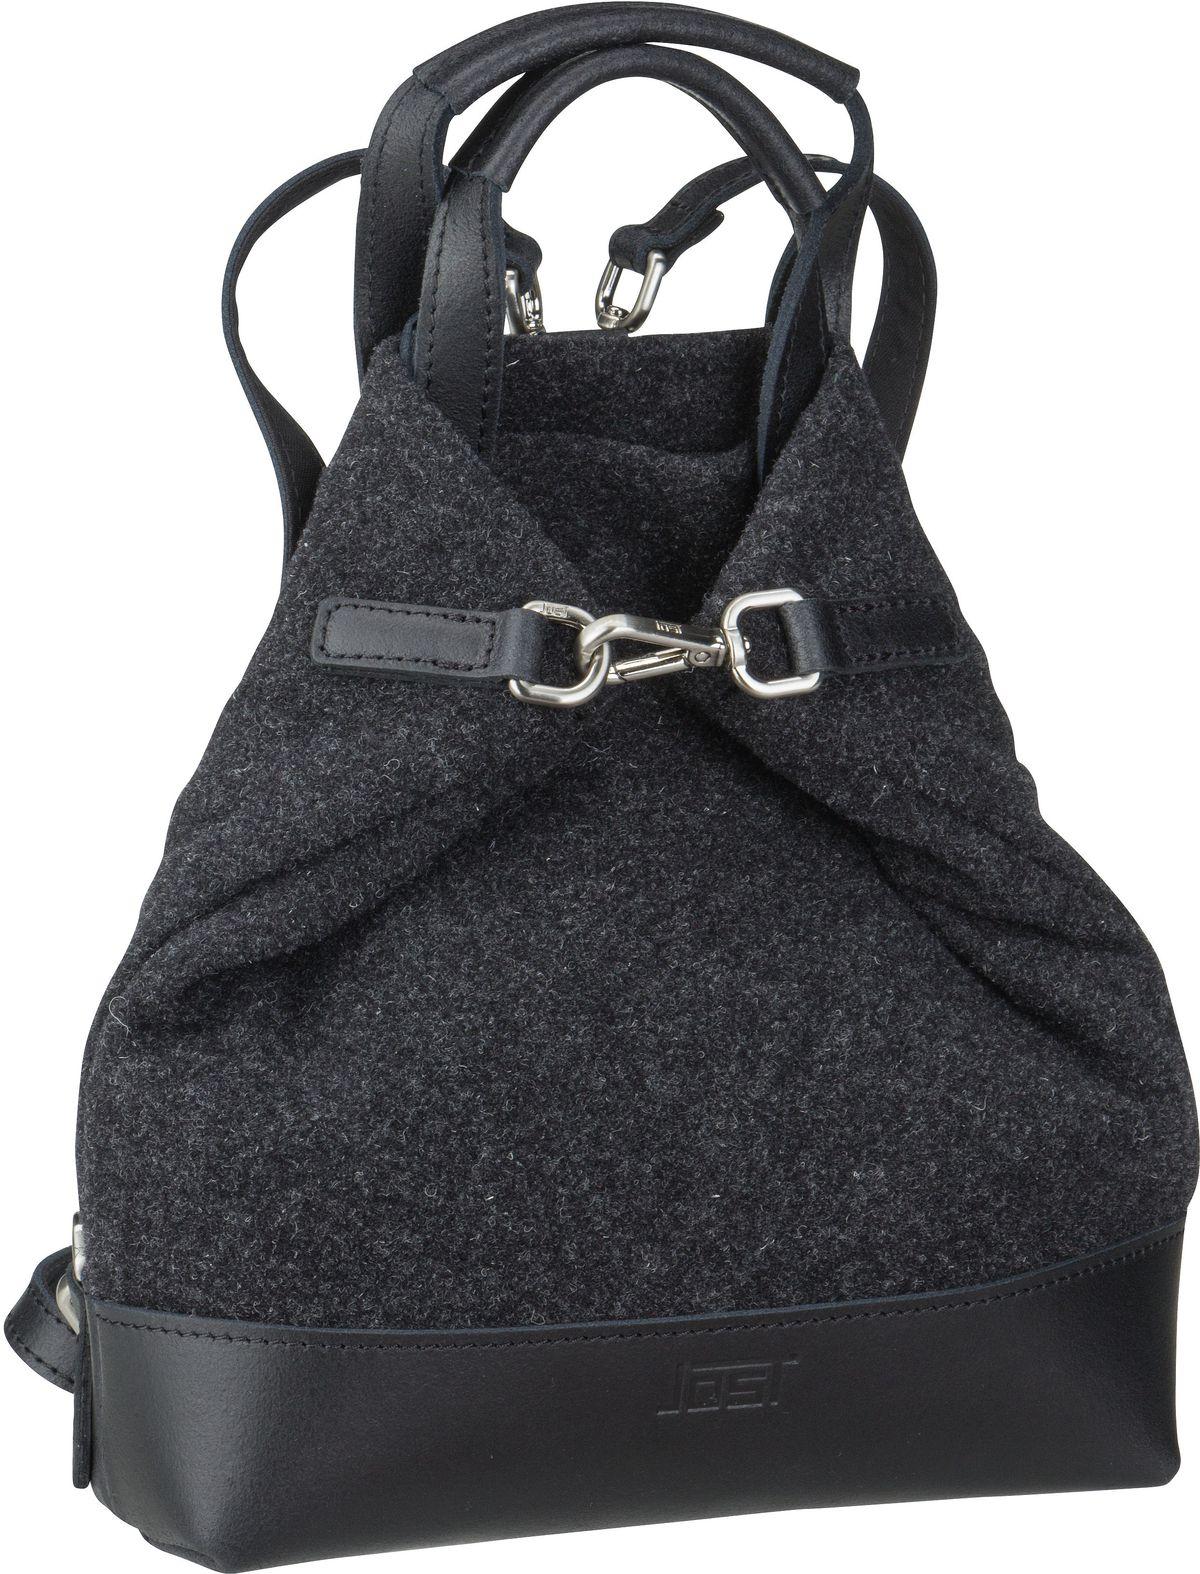 Rucksack / Daypack Farum 3024 X-Change Bag Mini Black